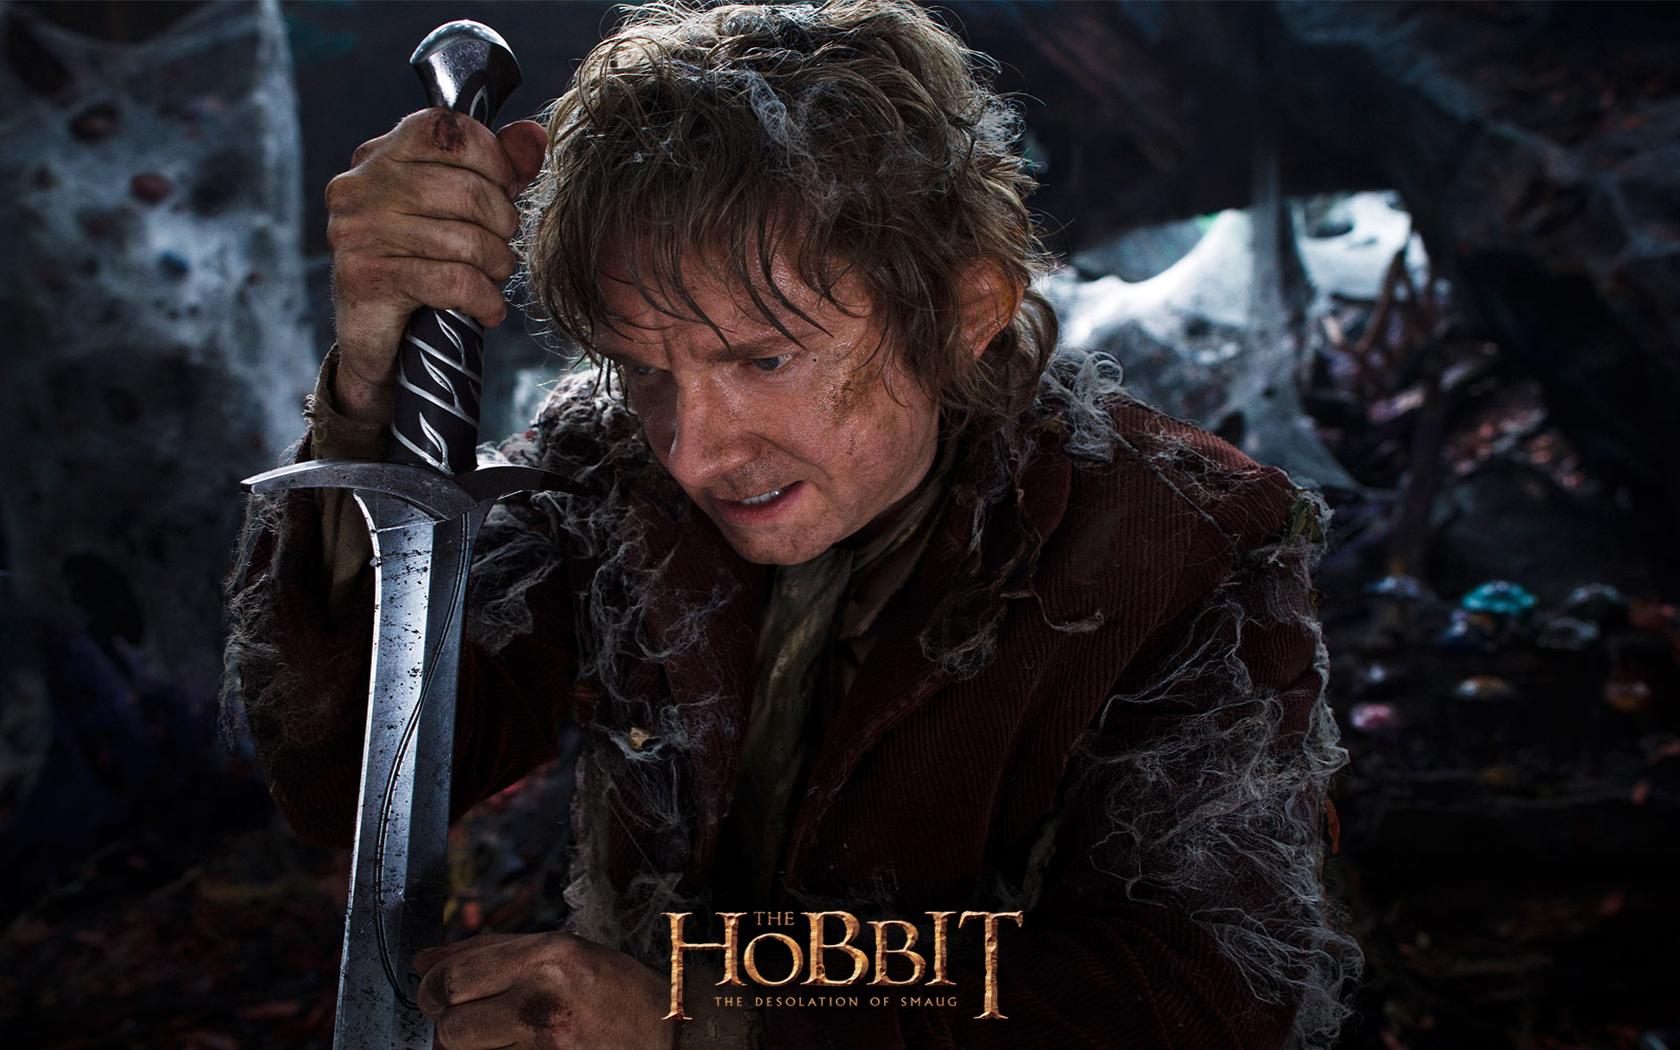 The Hobbit the Desolation of Smaug wallpaper 7